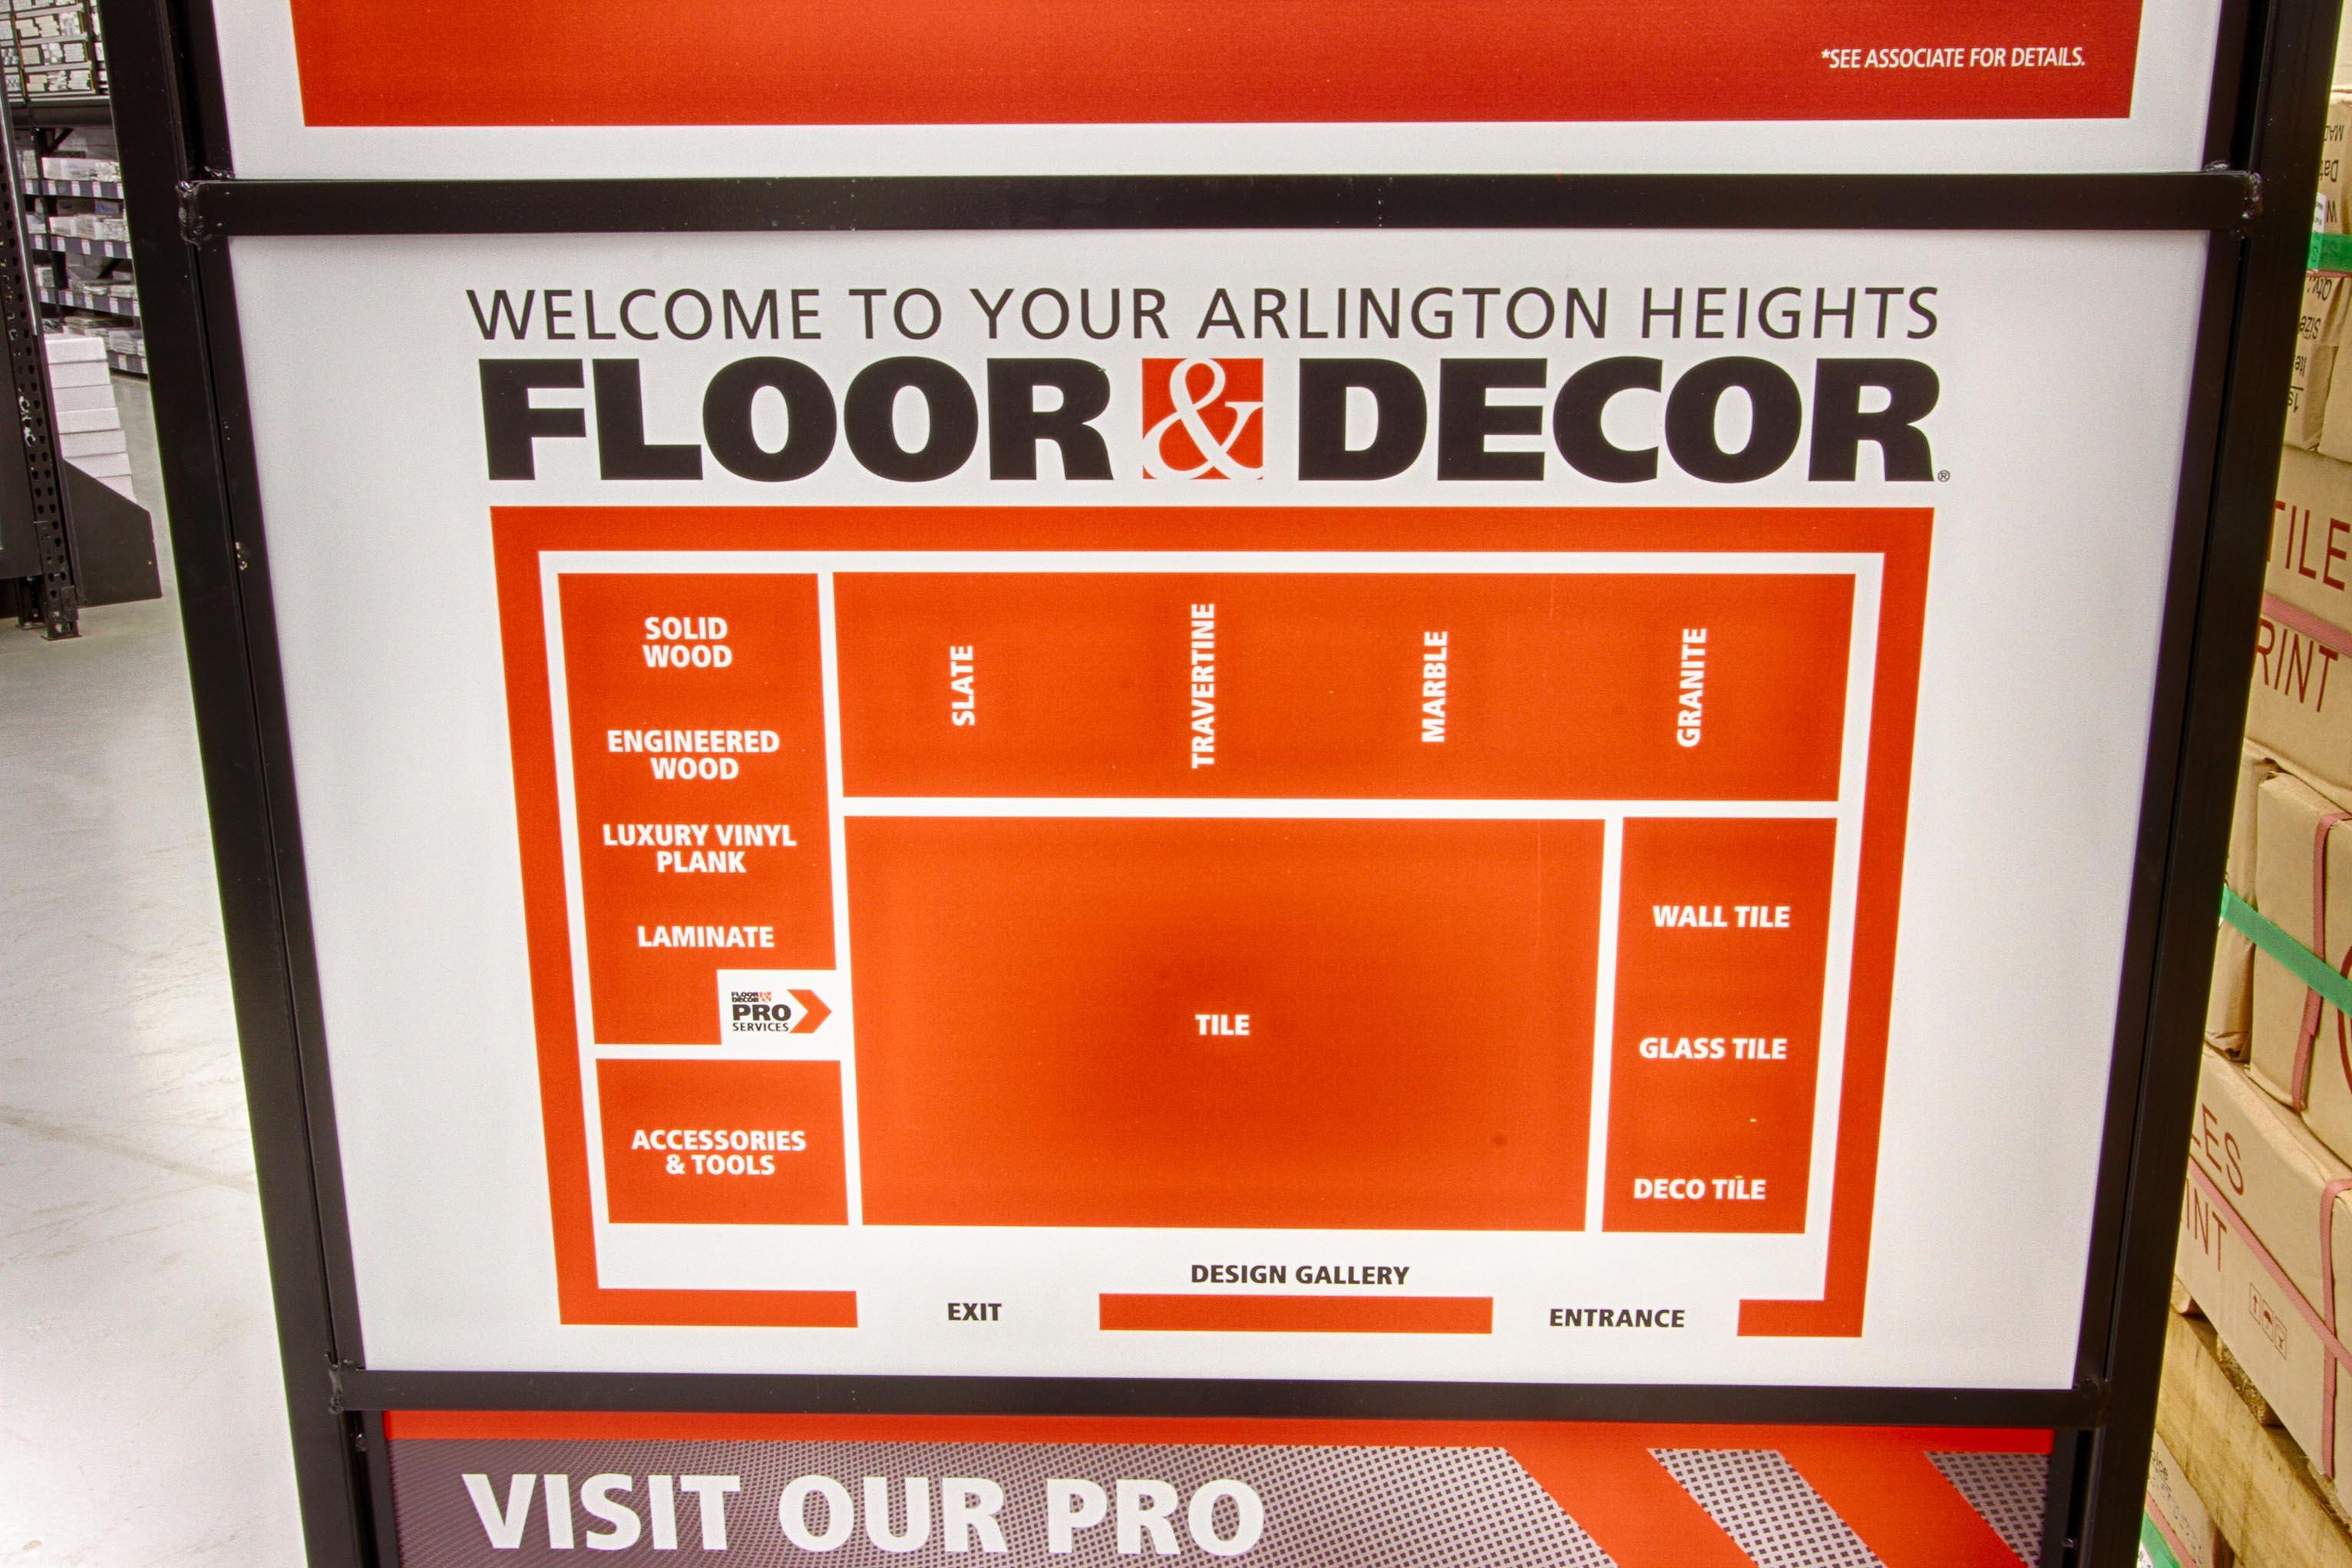 Floor decor coupons near me in arlington heights 8coupons for Floor and decor coupons